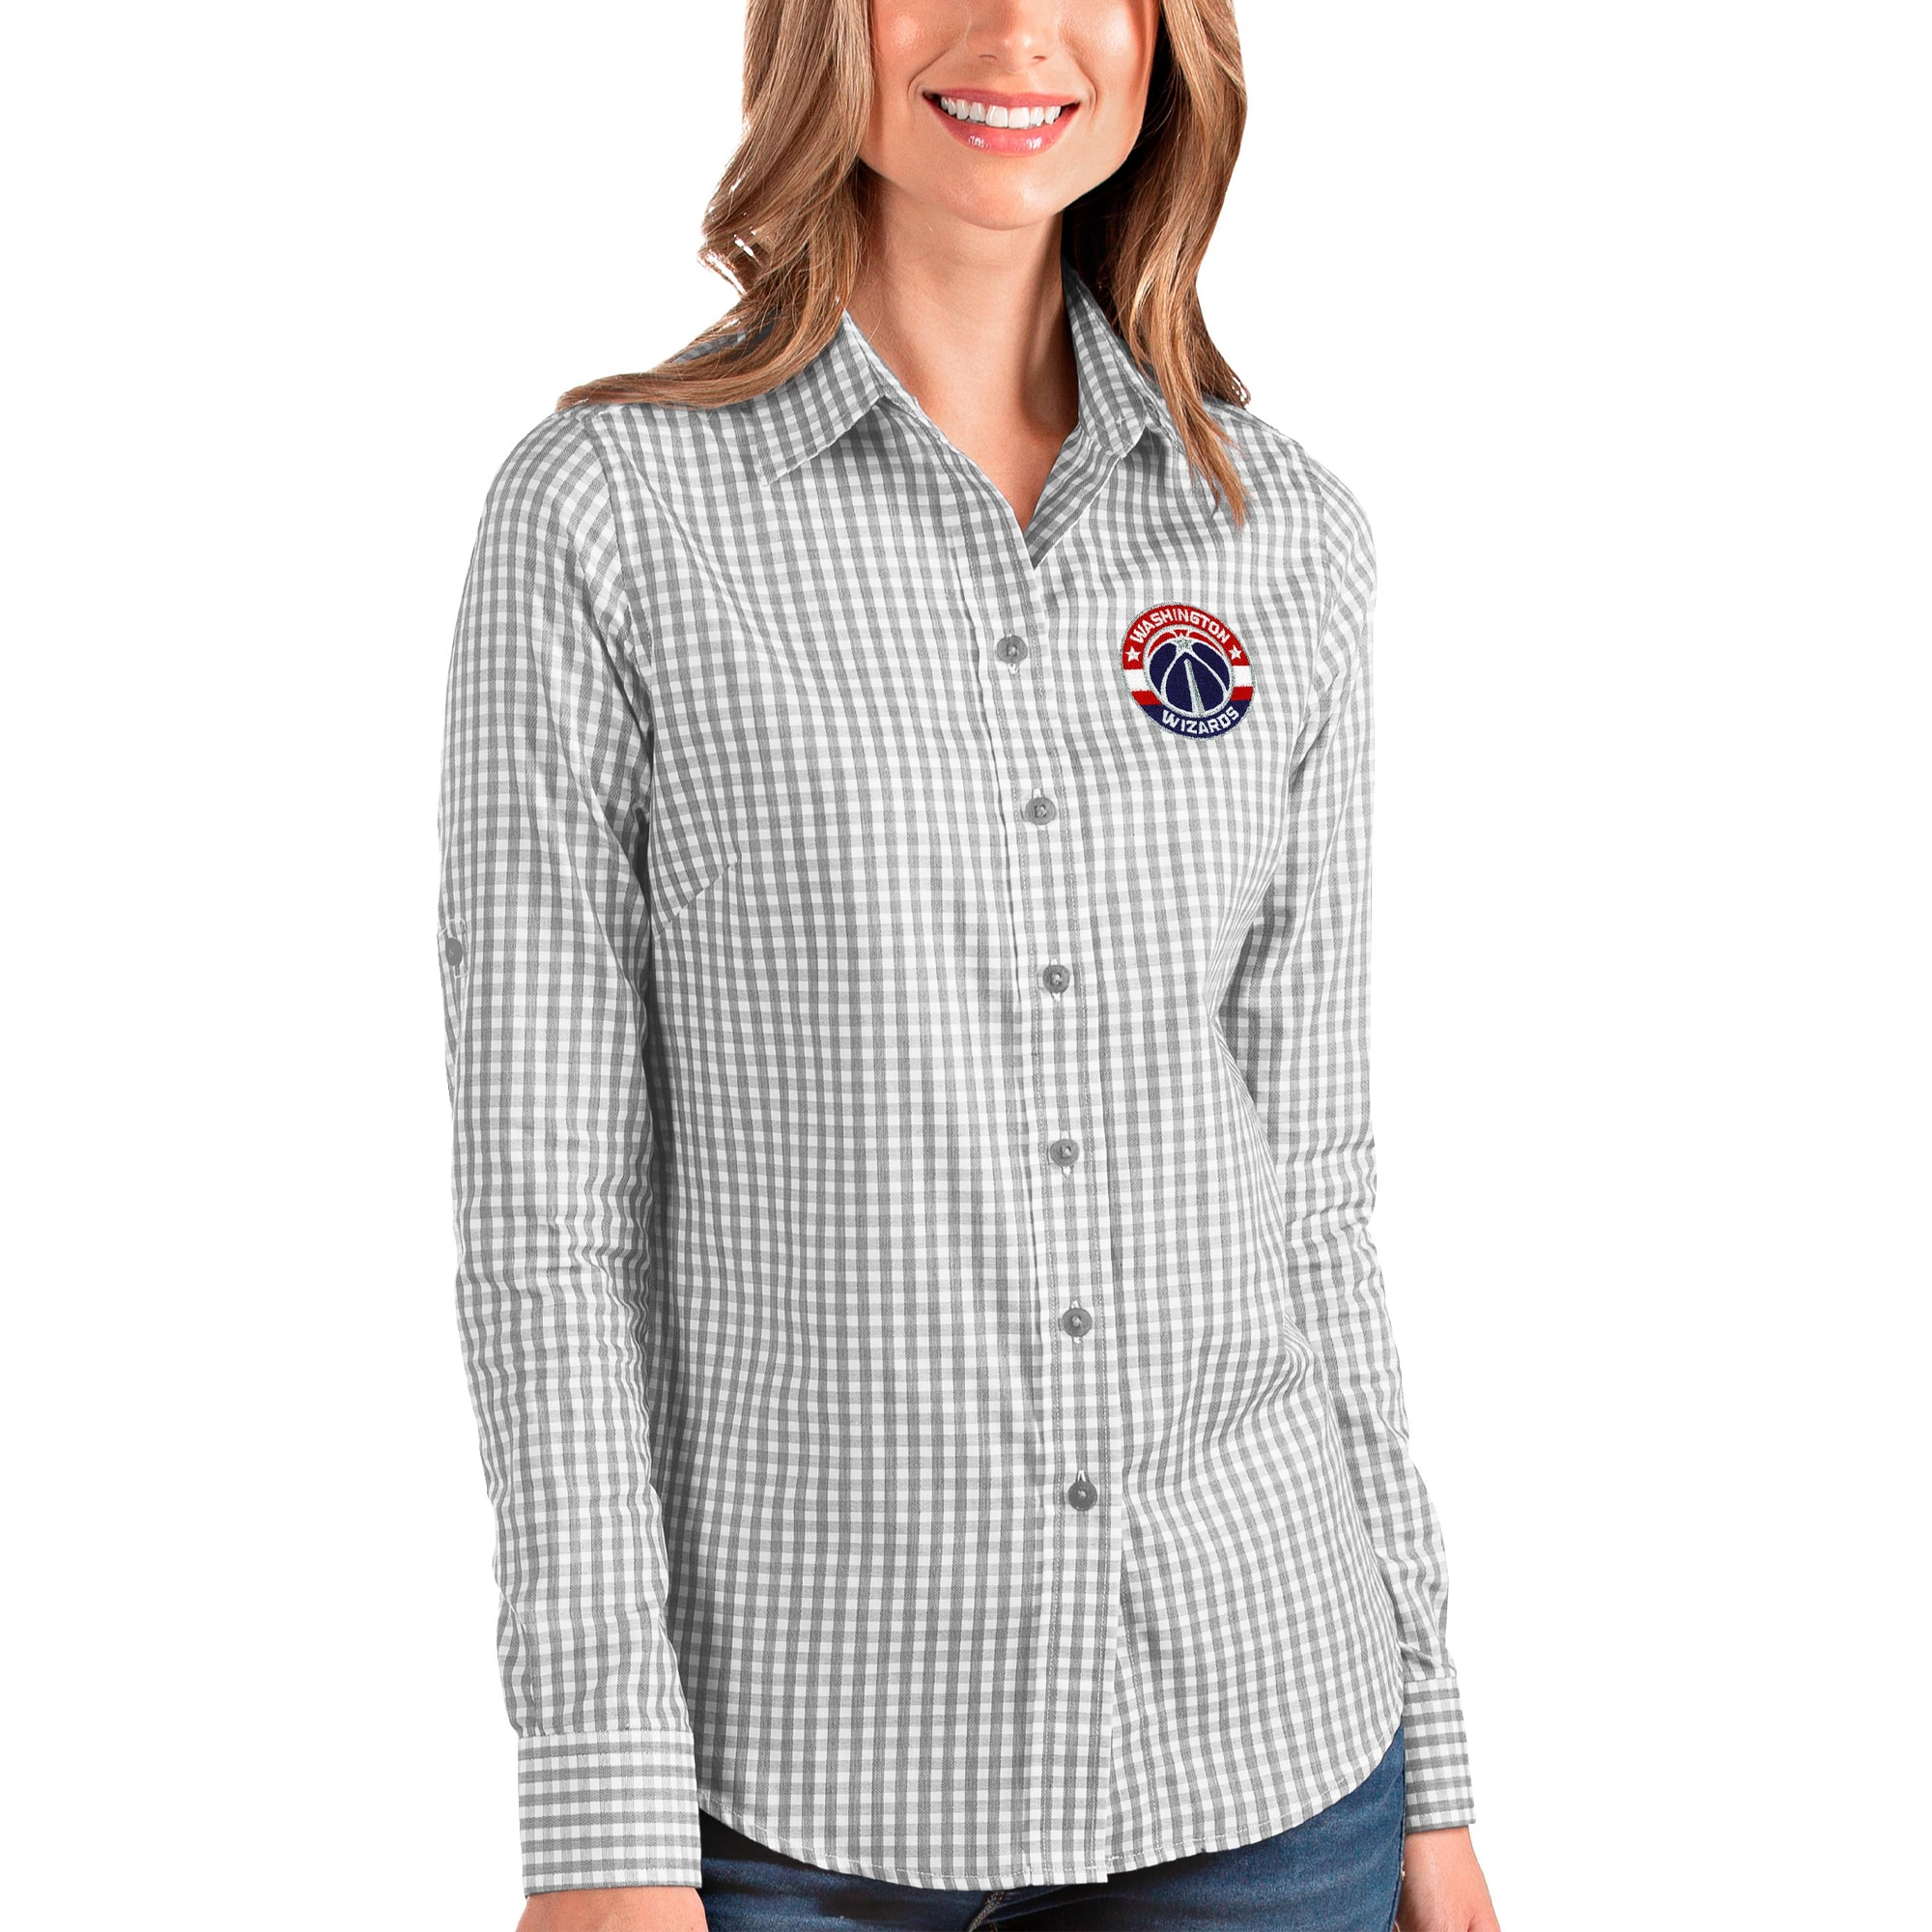 Washington Wizards Antigua Women's Structure Button-Up Long Sleeve Shirt - Charcoal/White